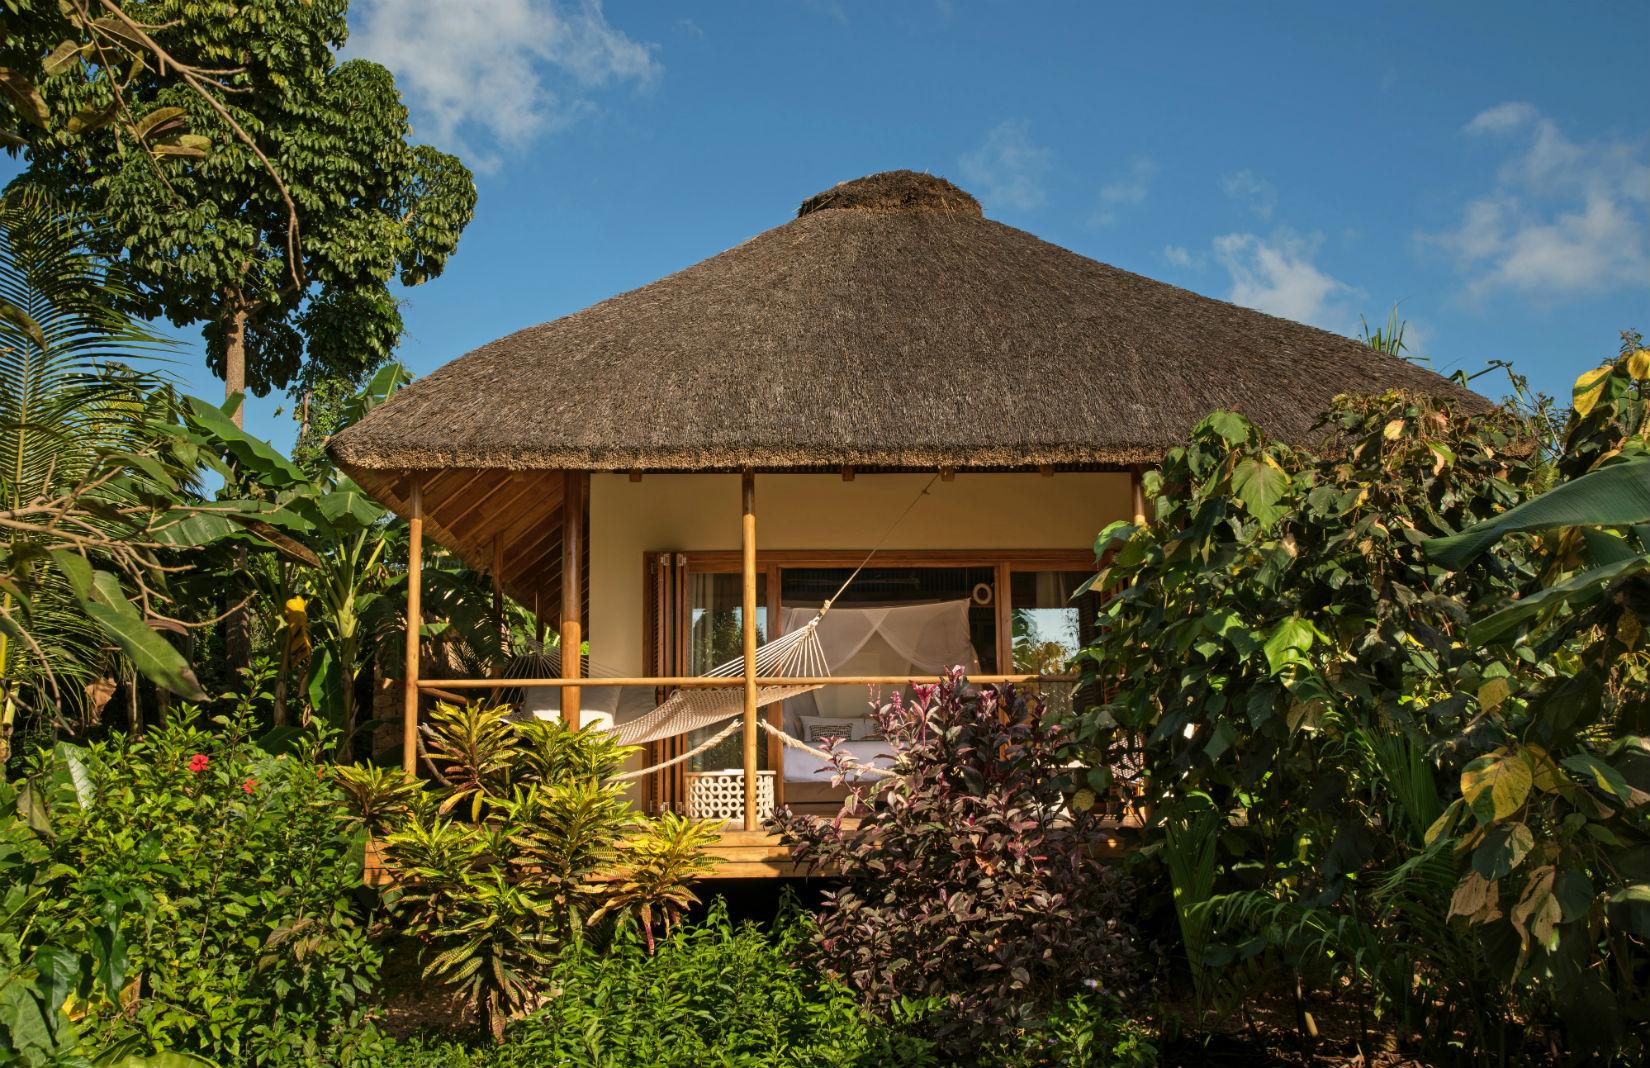 New hotels in 2018 including Zuri Zanzibar